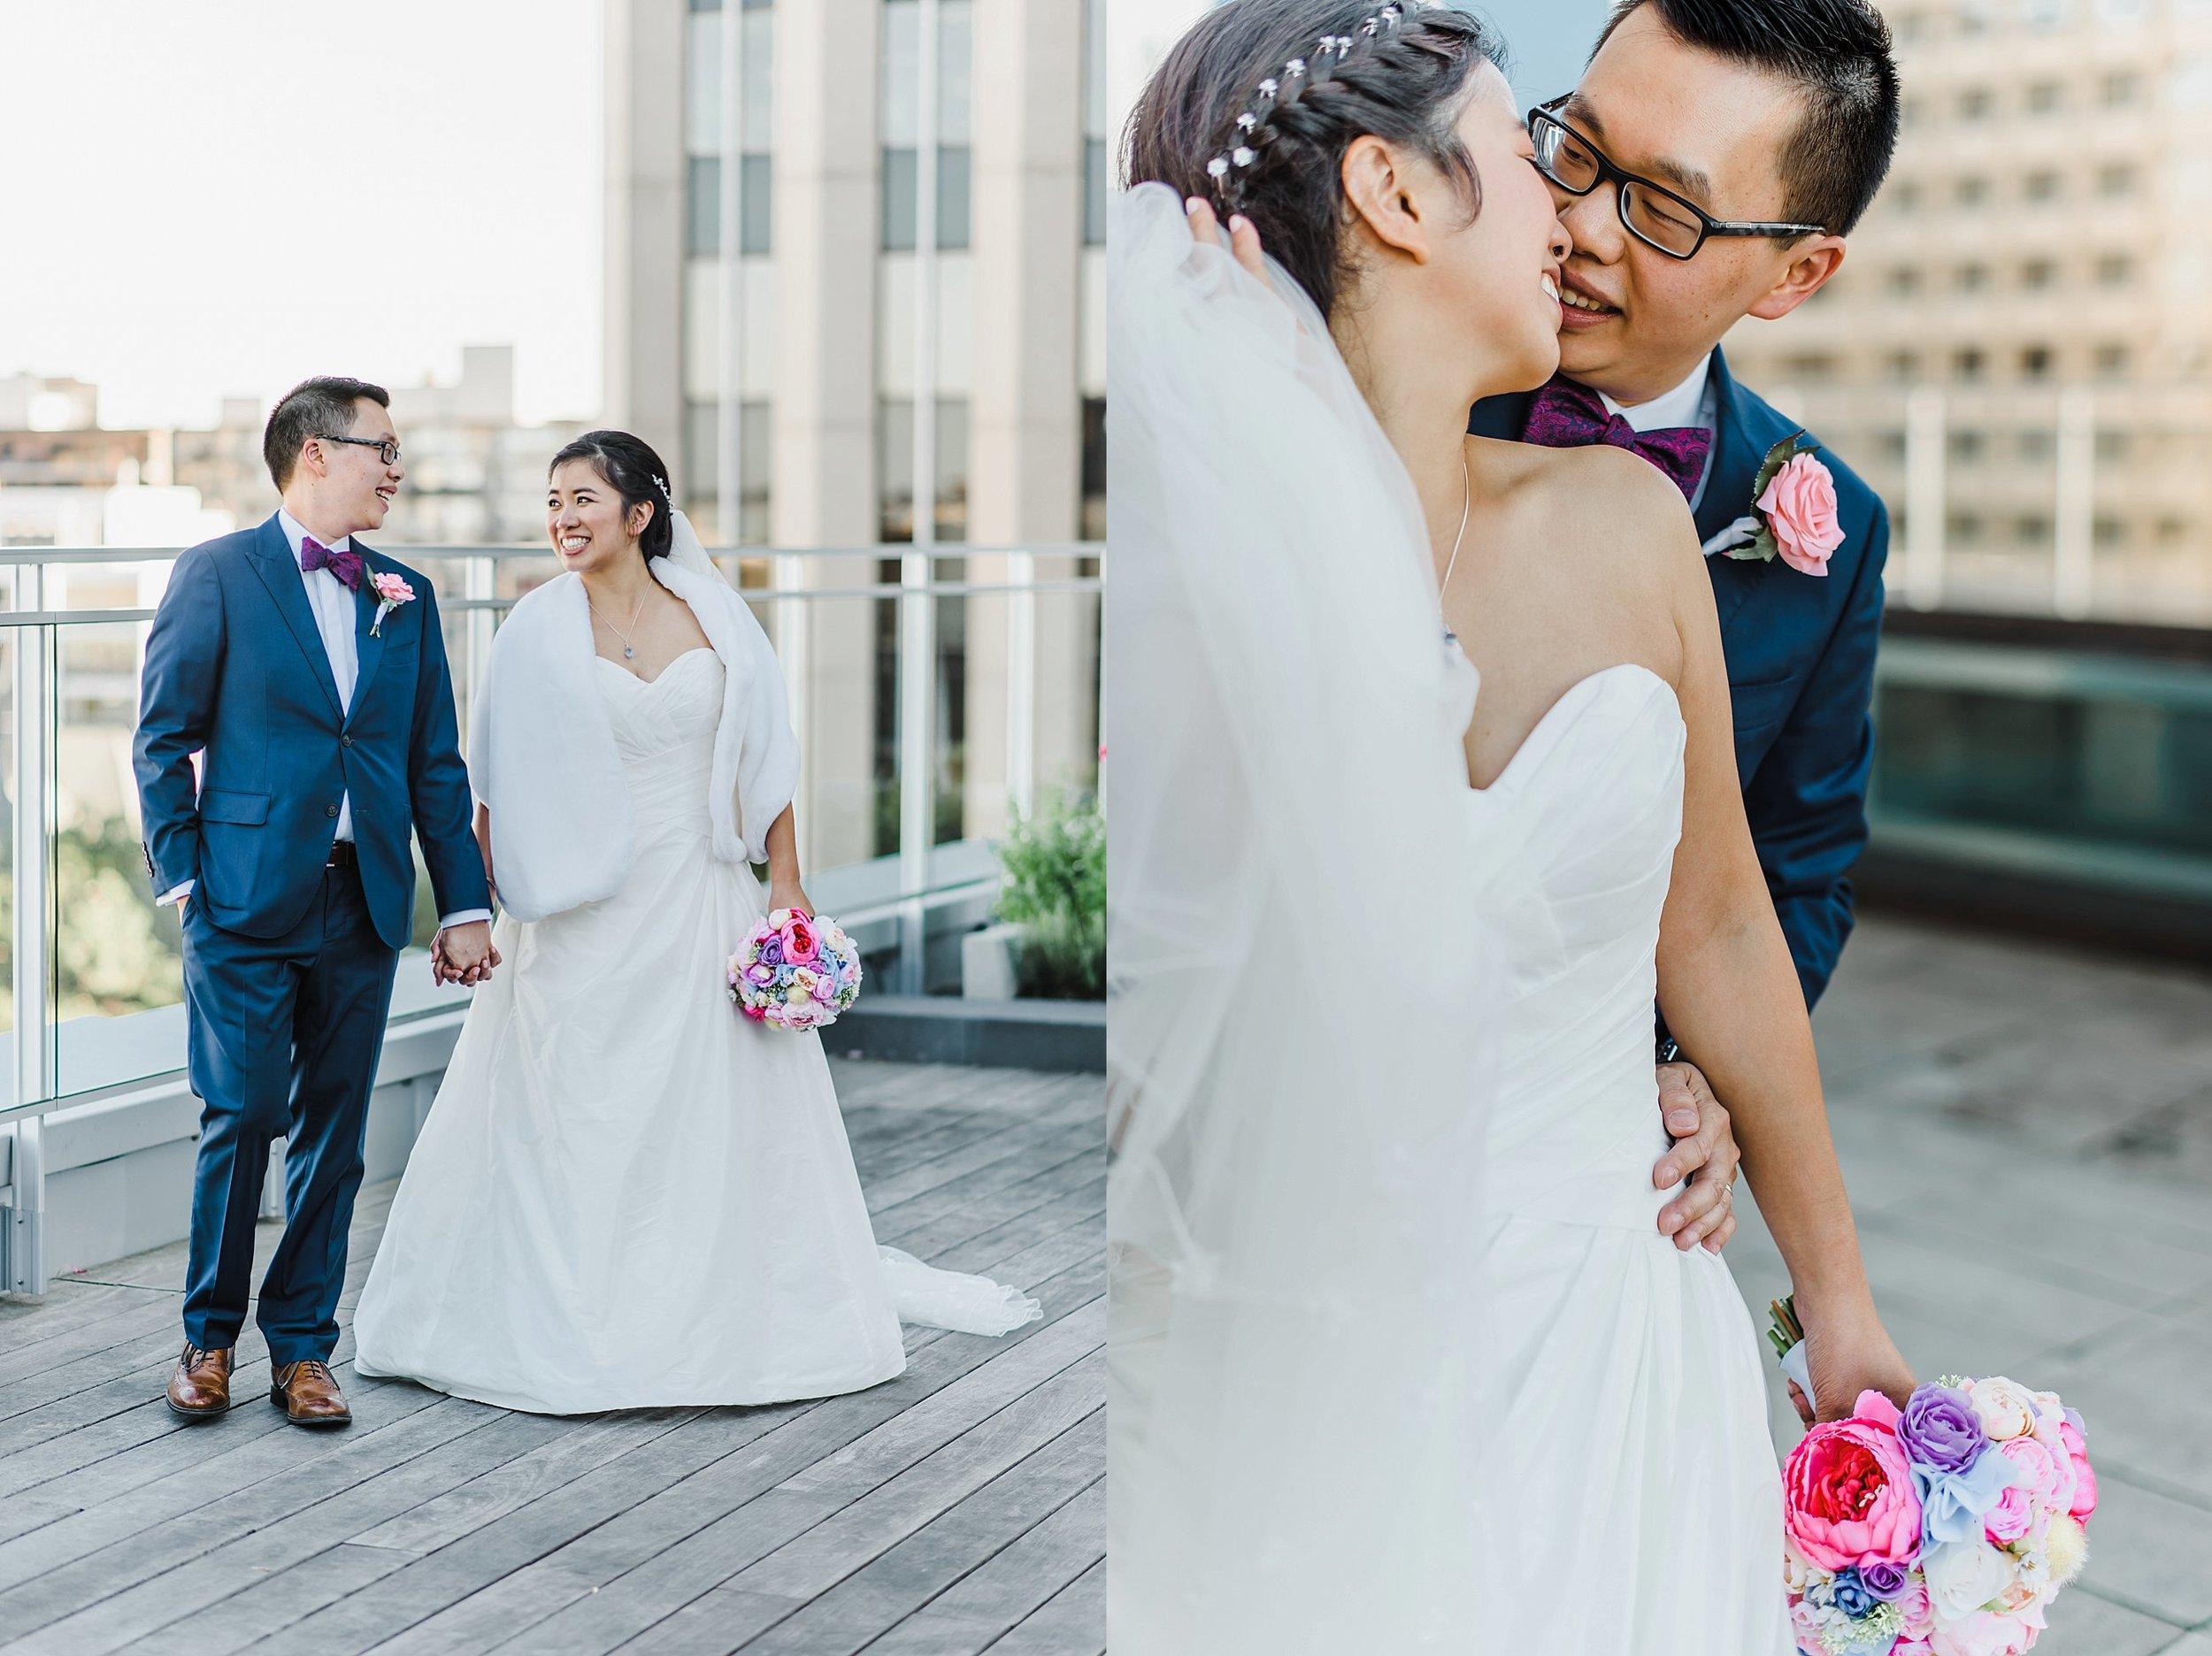 light airy indie fine art ottawa wedding photographer | Ali and Batoul Photography_1521.jpg